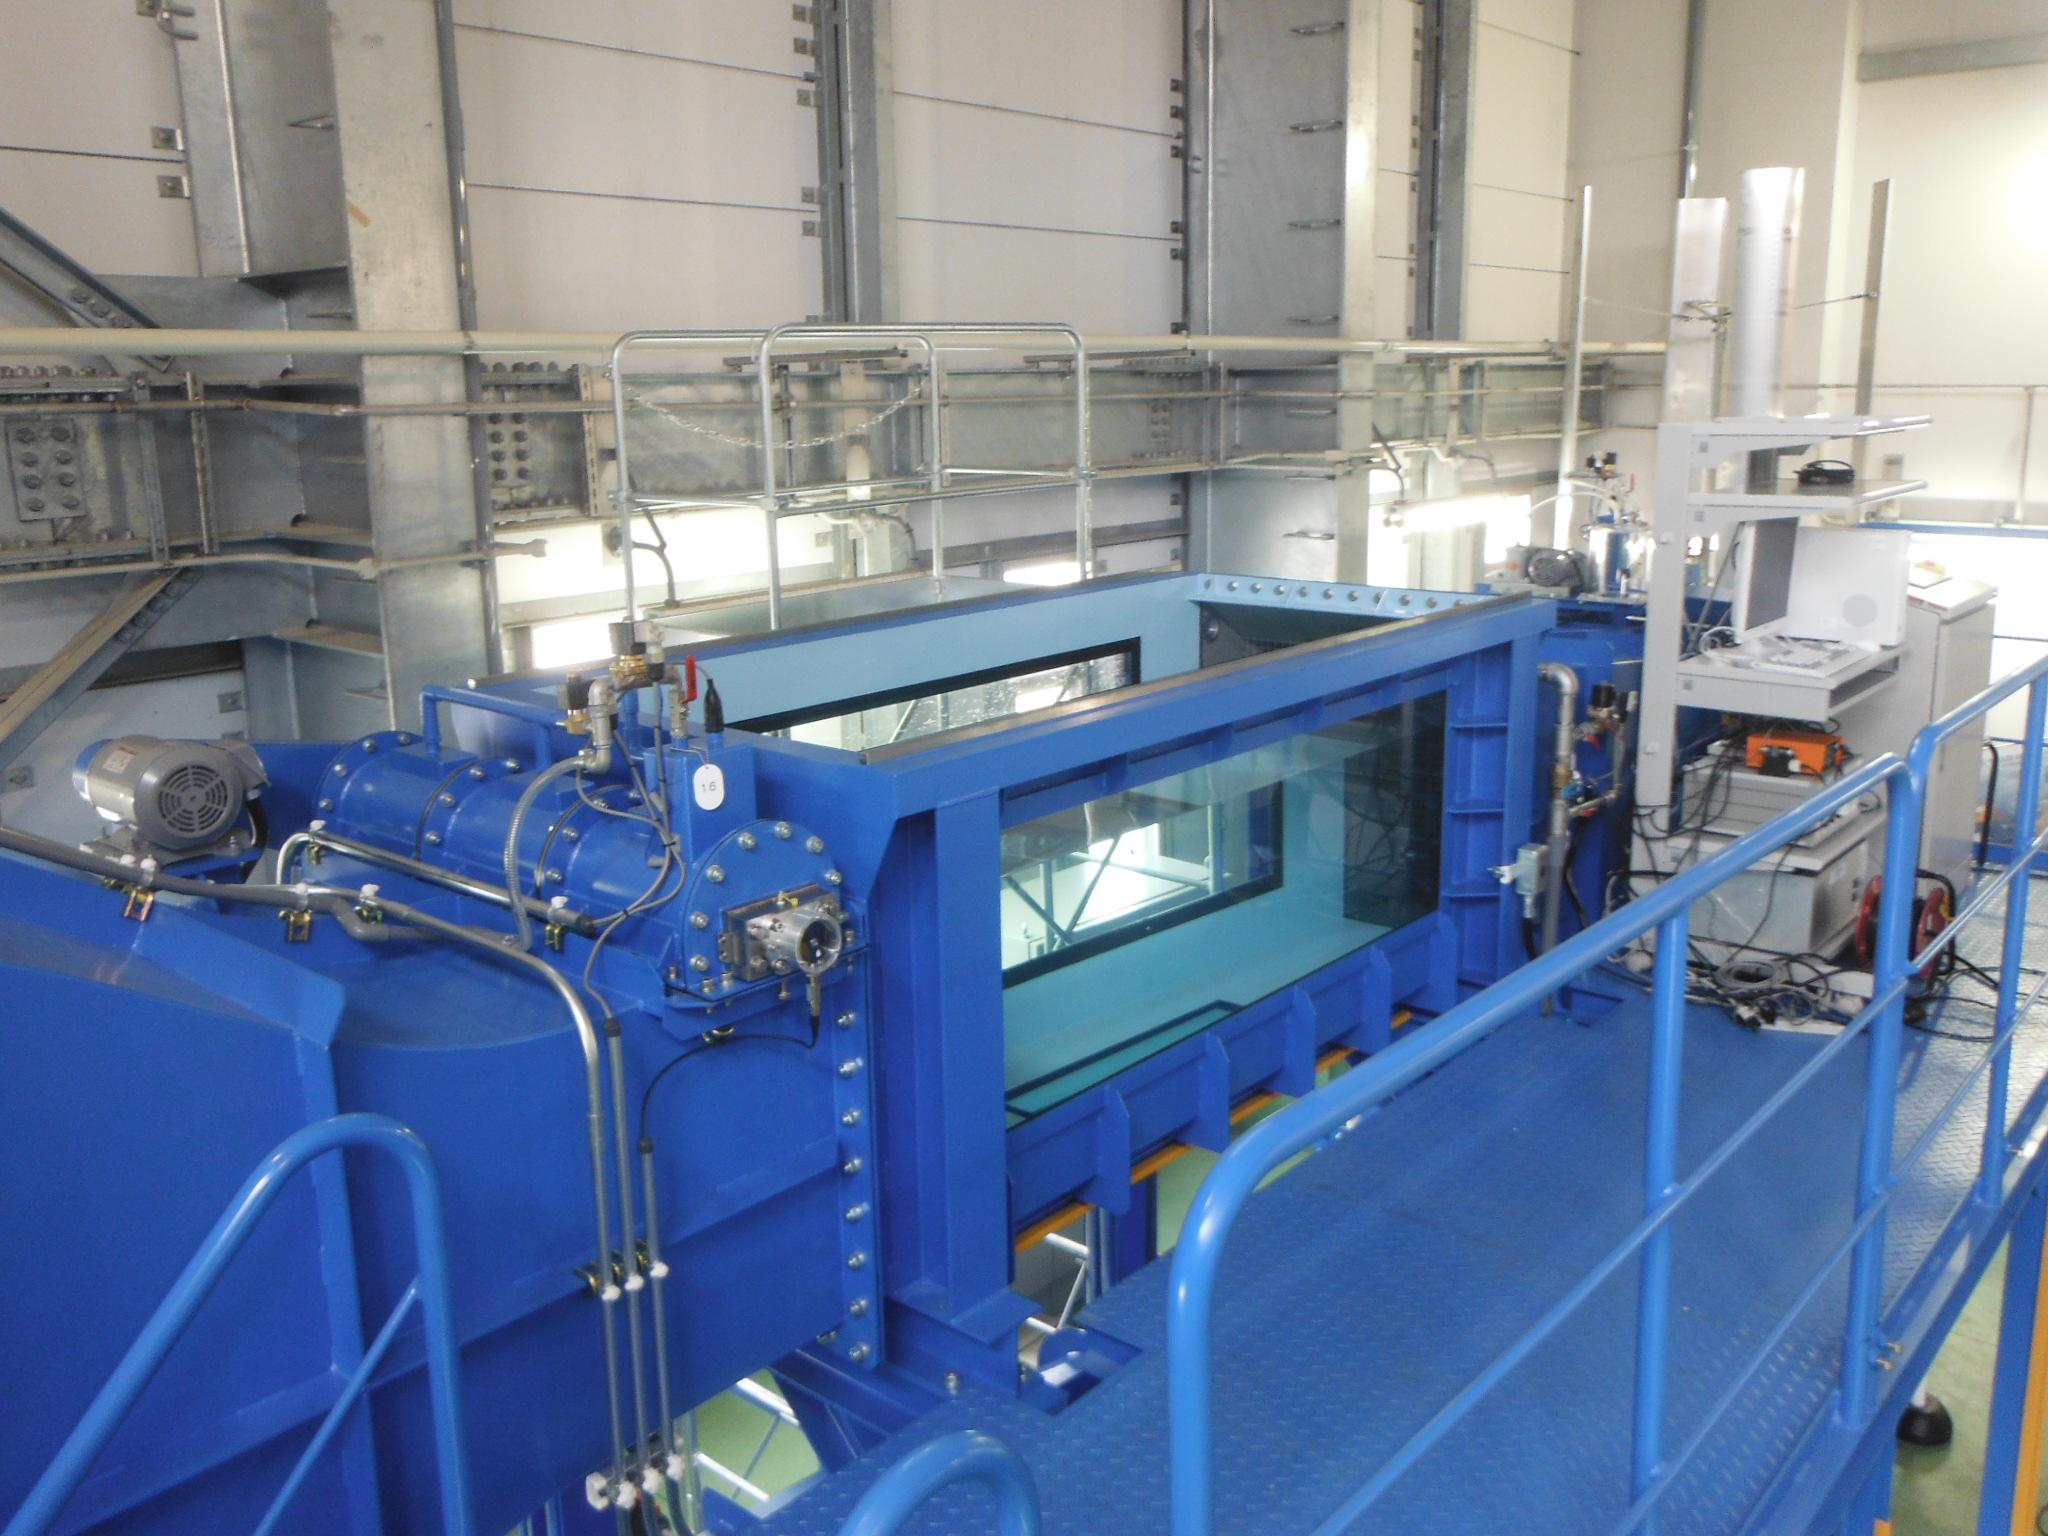 IOES Facilities|About IOES|INSTITUTE OF OCEAN ENERGY SAGA